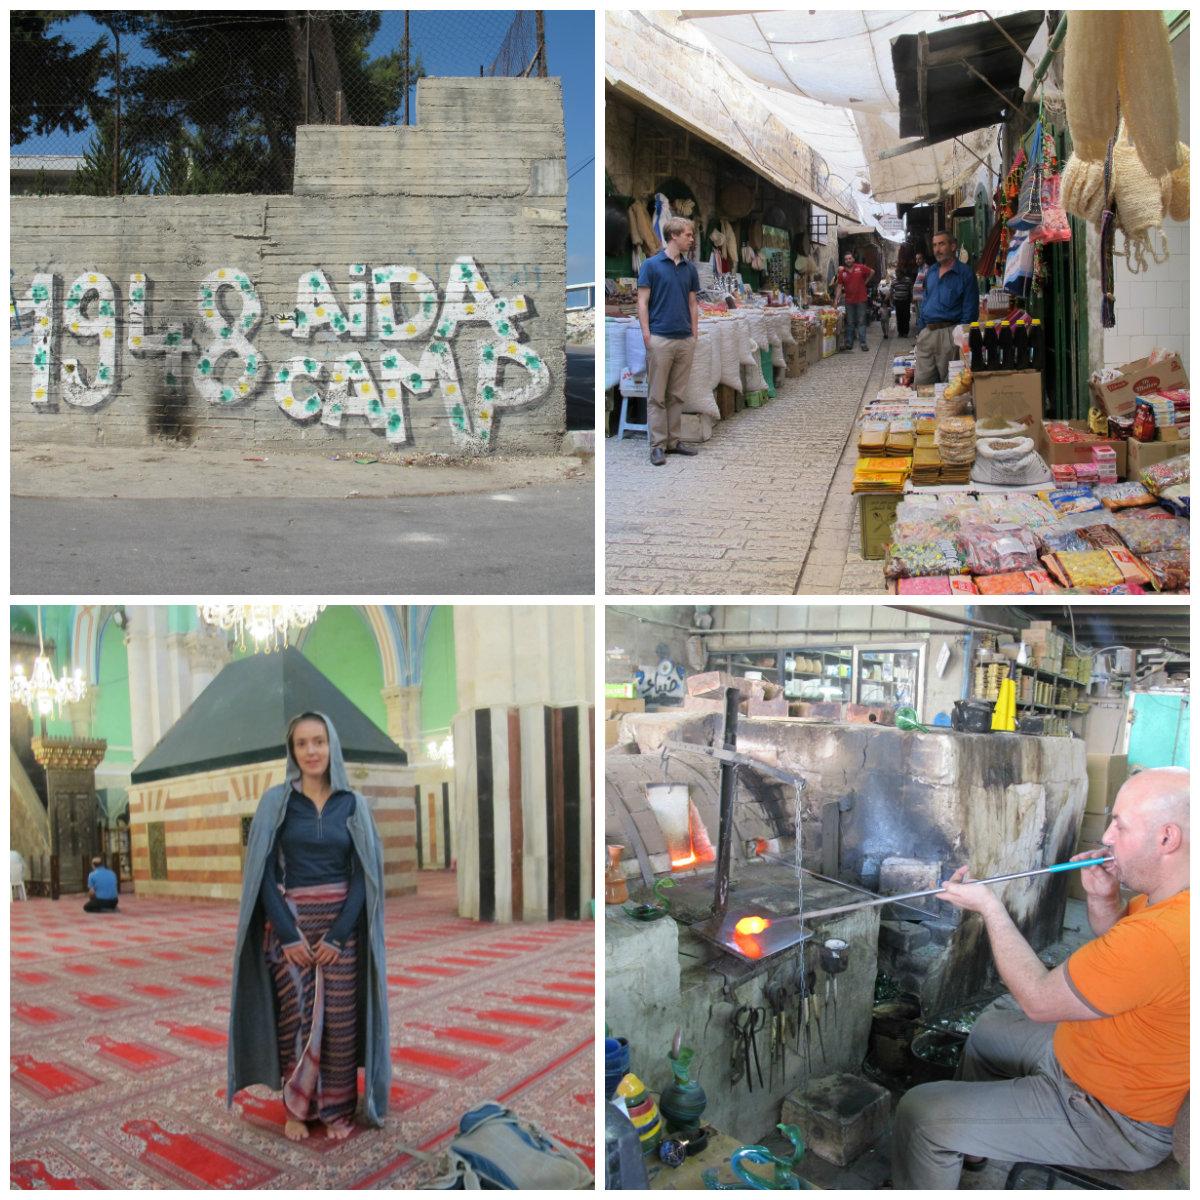 Tour of Palestine